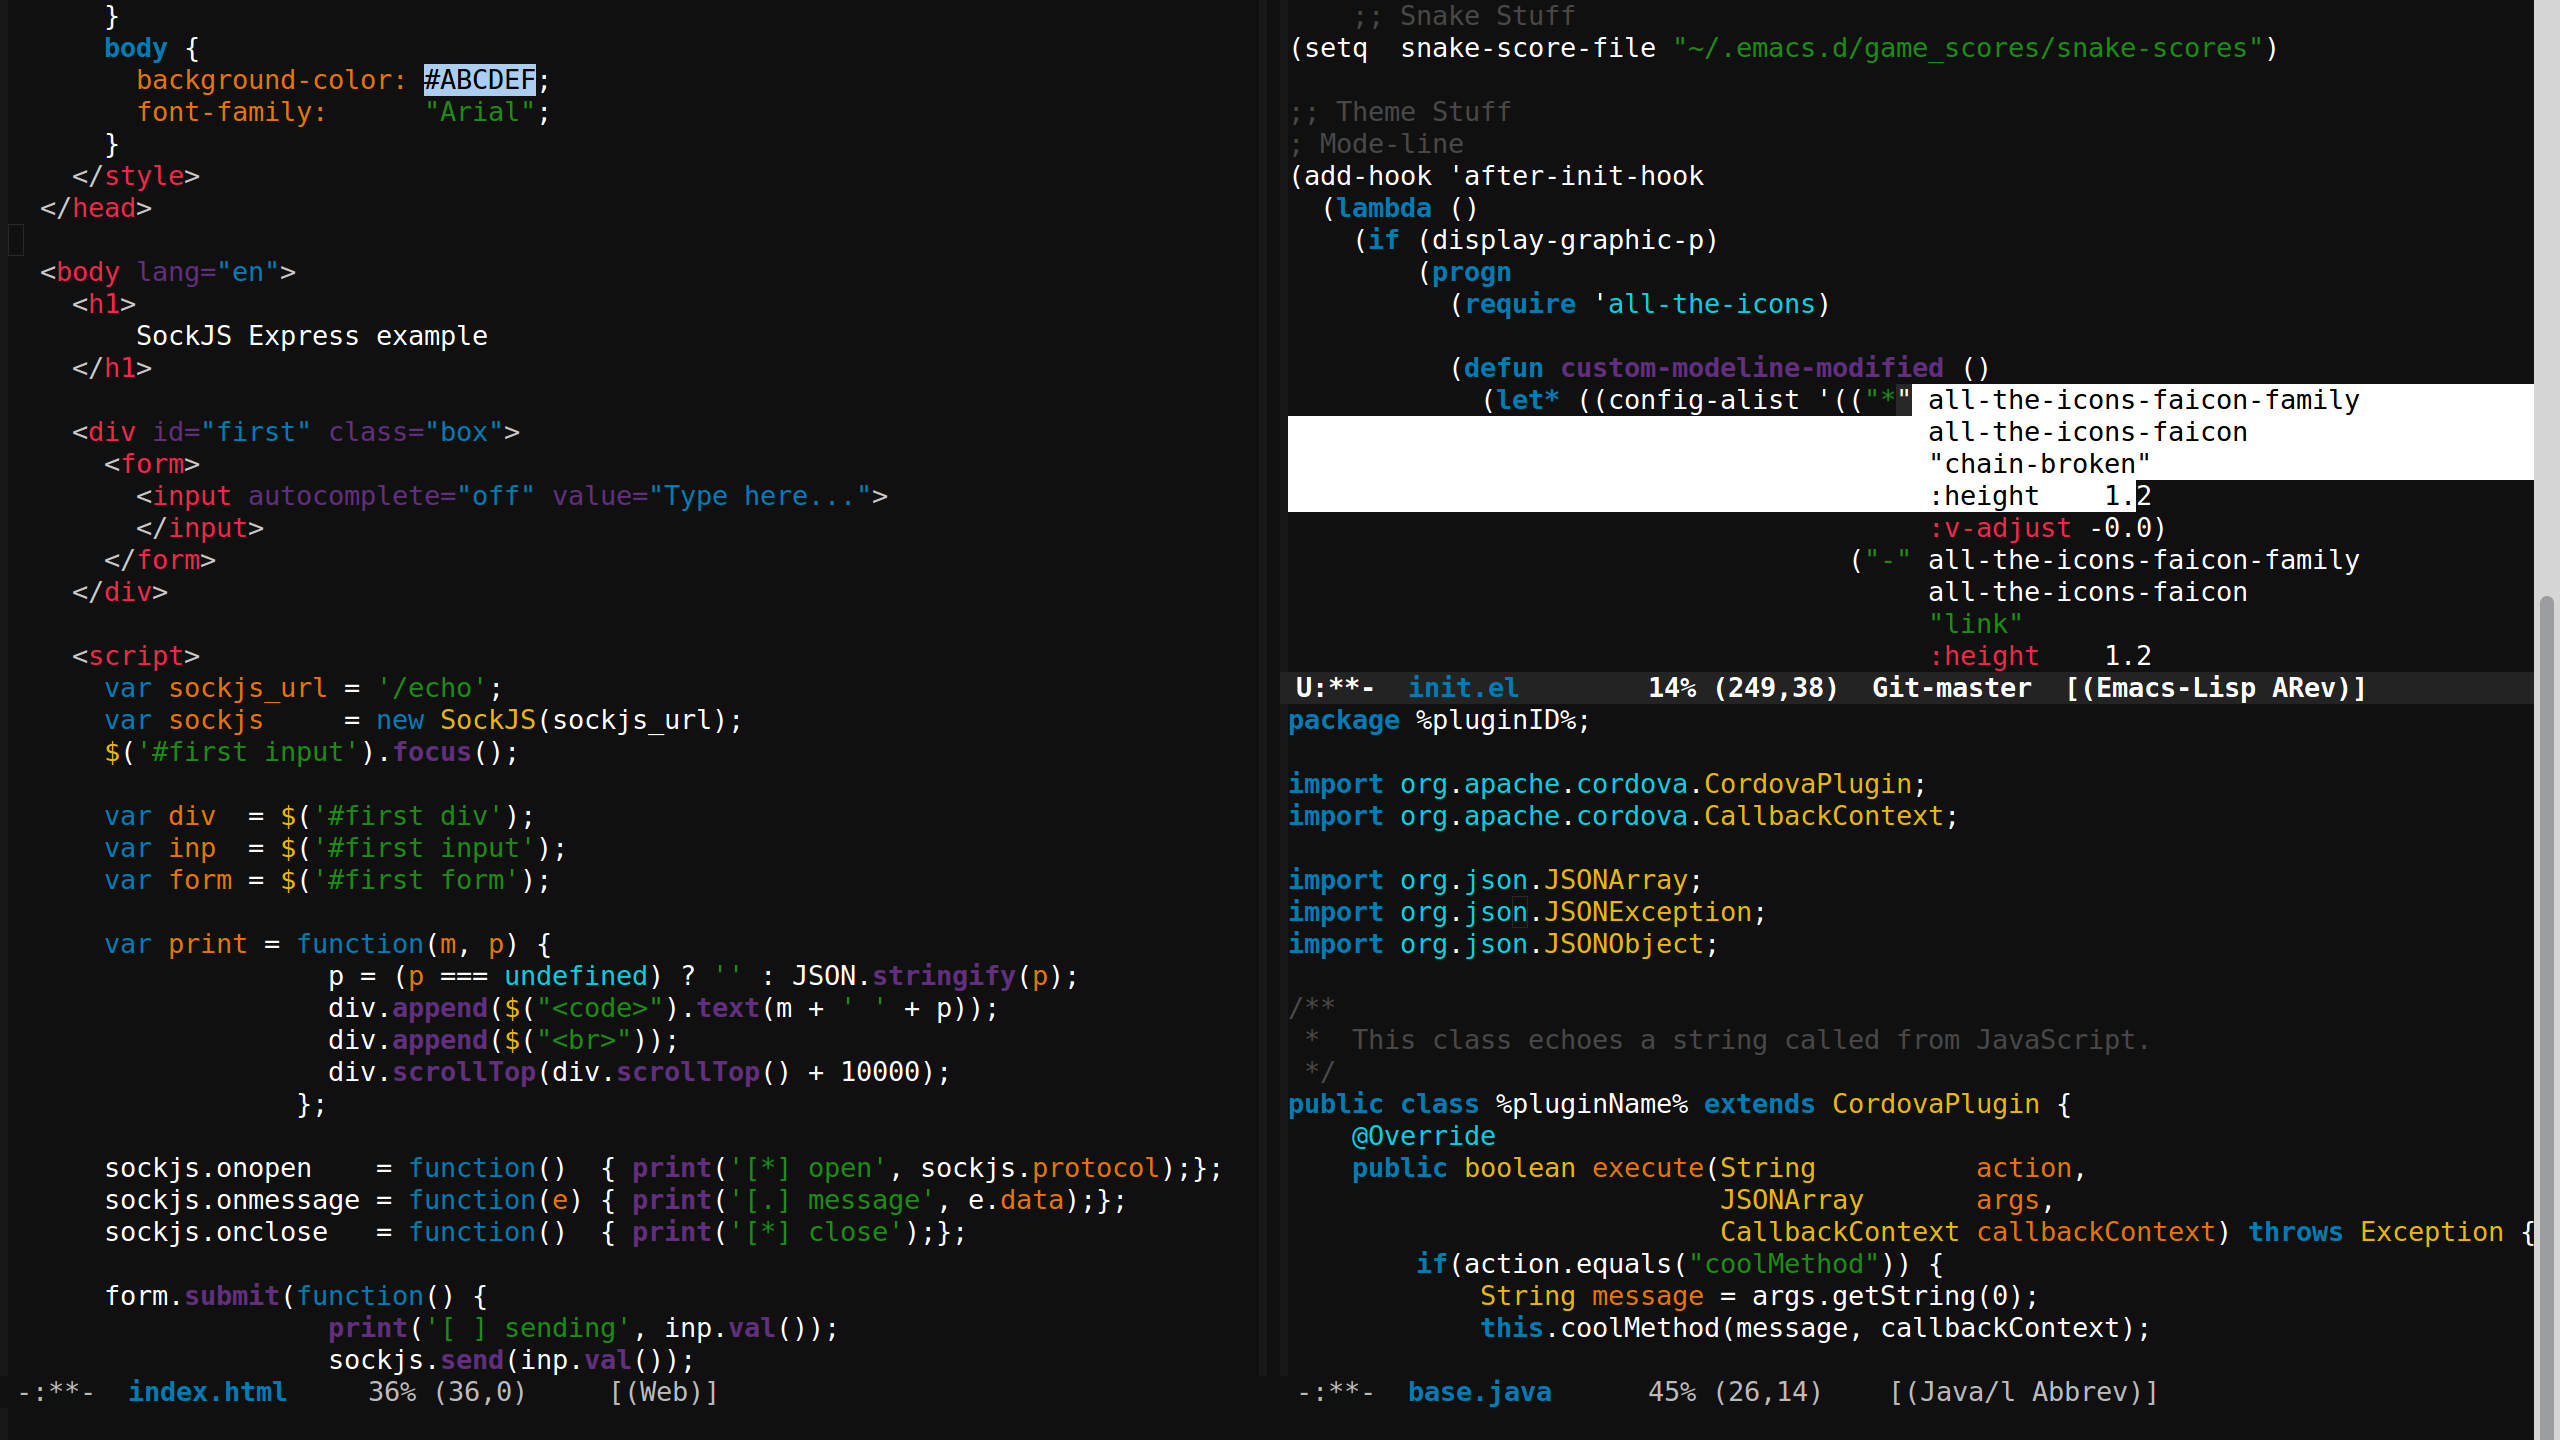 Web, Lisp, and Java Modes